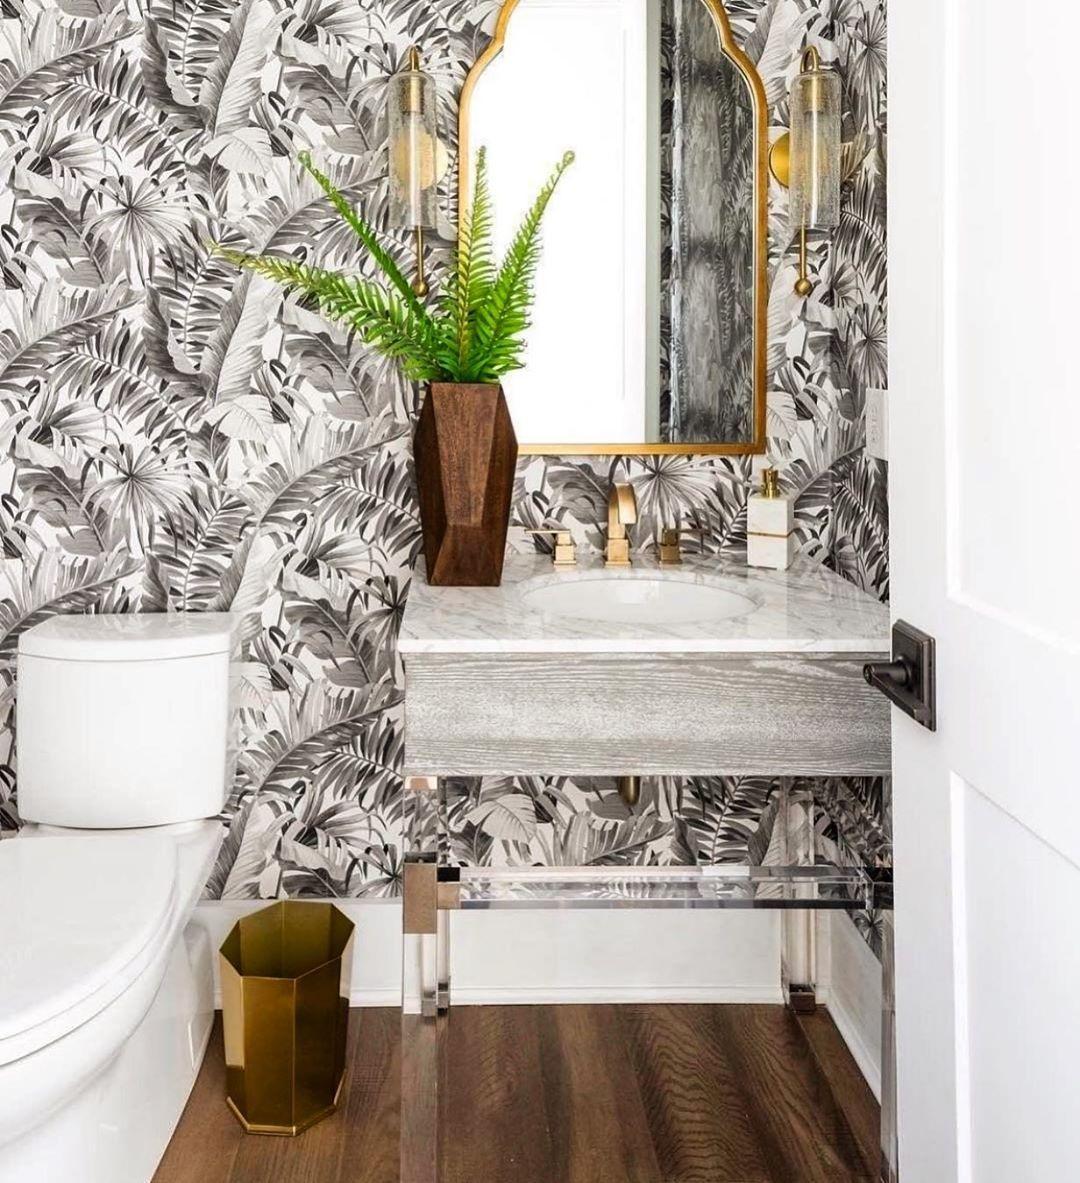 Lovely Tropical Themed Bathroom Bathroom Tropicaldecor Bathroom Bathroominspiration T Powder Room Wallpaper Palm Leaf Wallpaper Leaf Wallpaper Fashionable style bathroom wallpaper